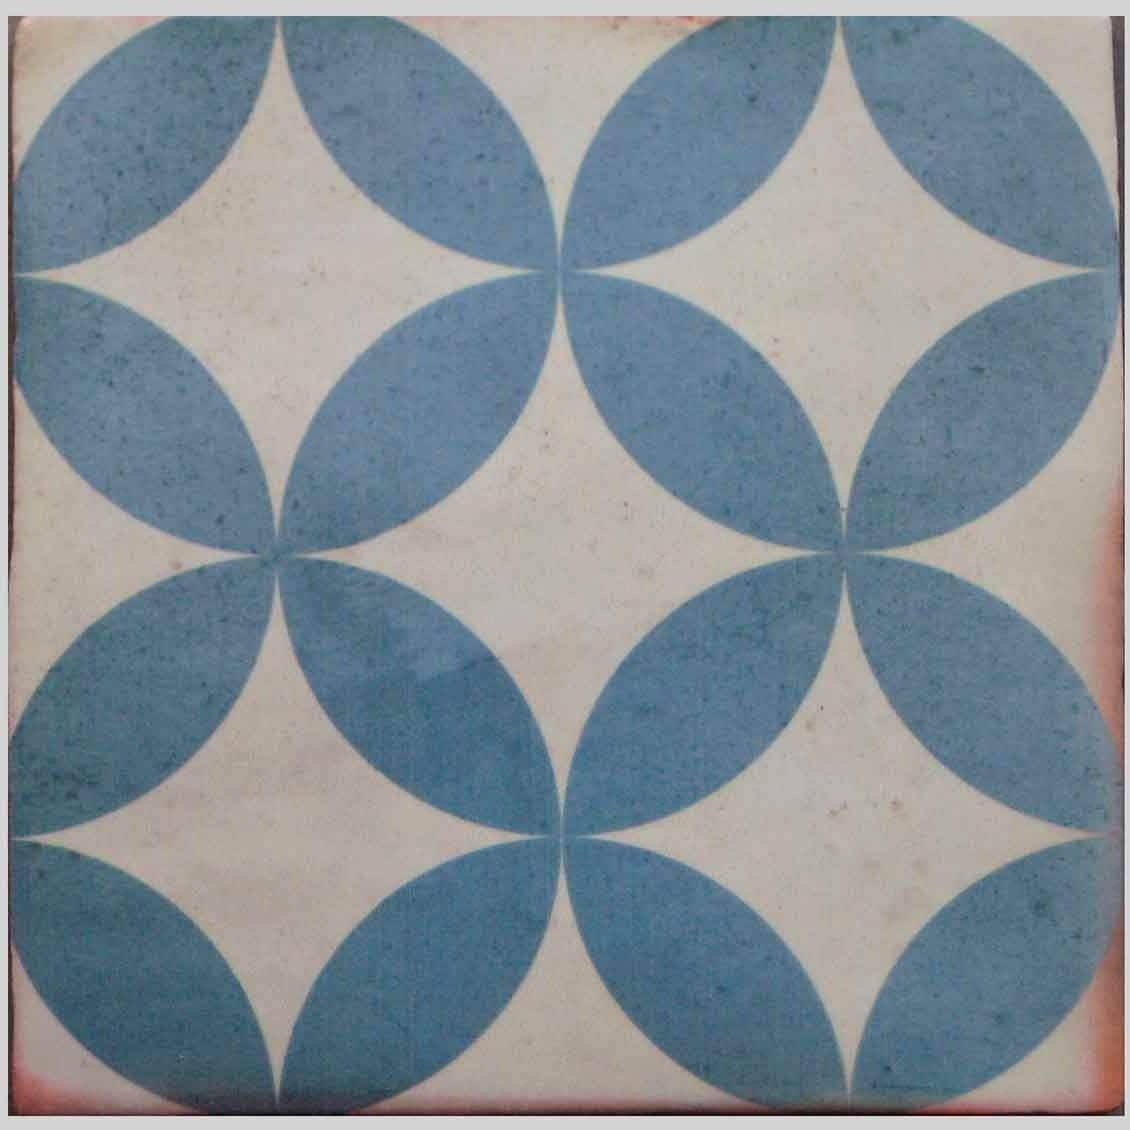 carrelage imitation carreau ciment comptoir du c rame 56 m2 bords marron rose bof. Black Bedroom Furniture Sets. Home Design Ideas